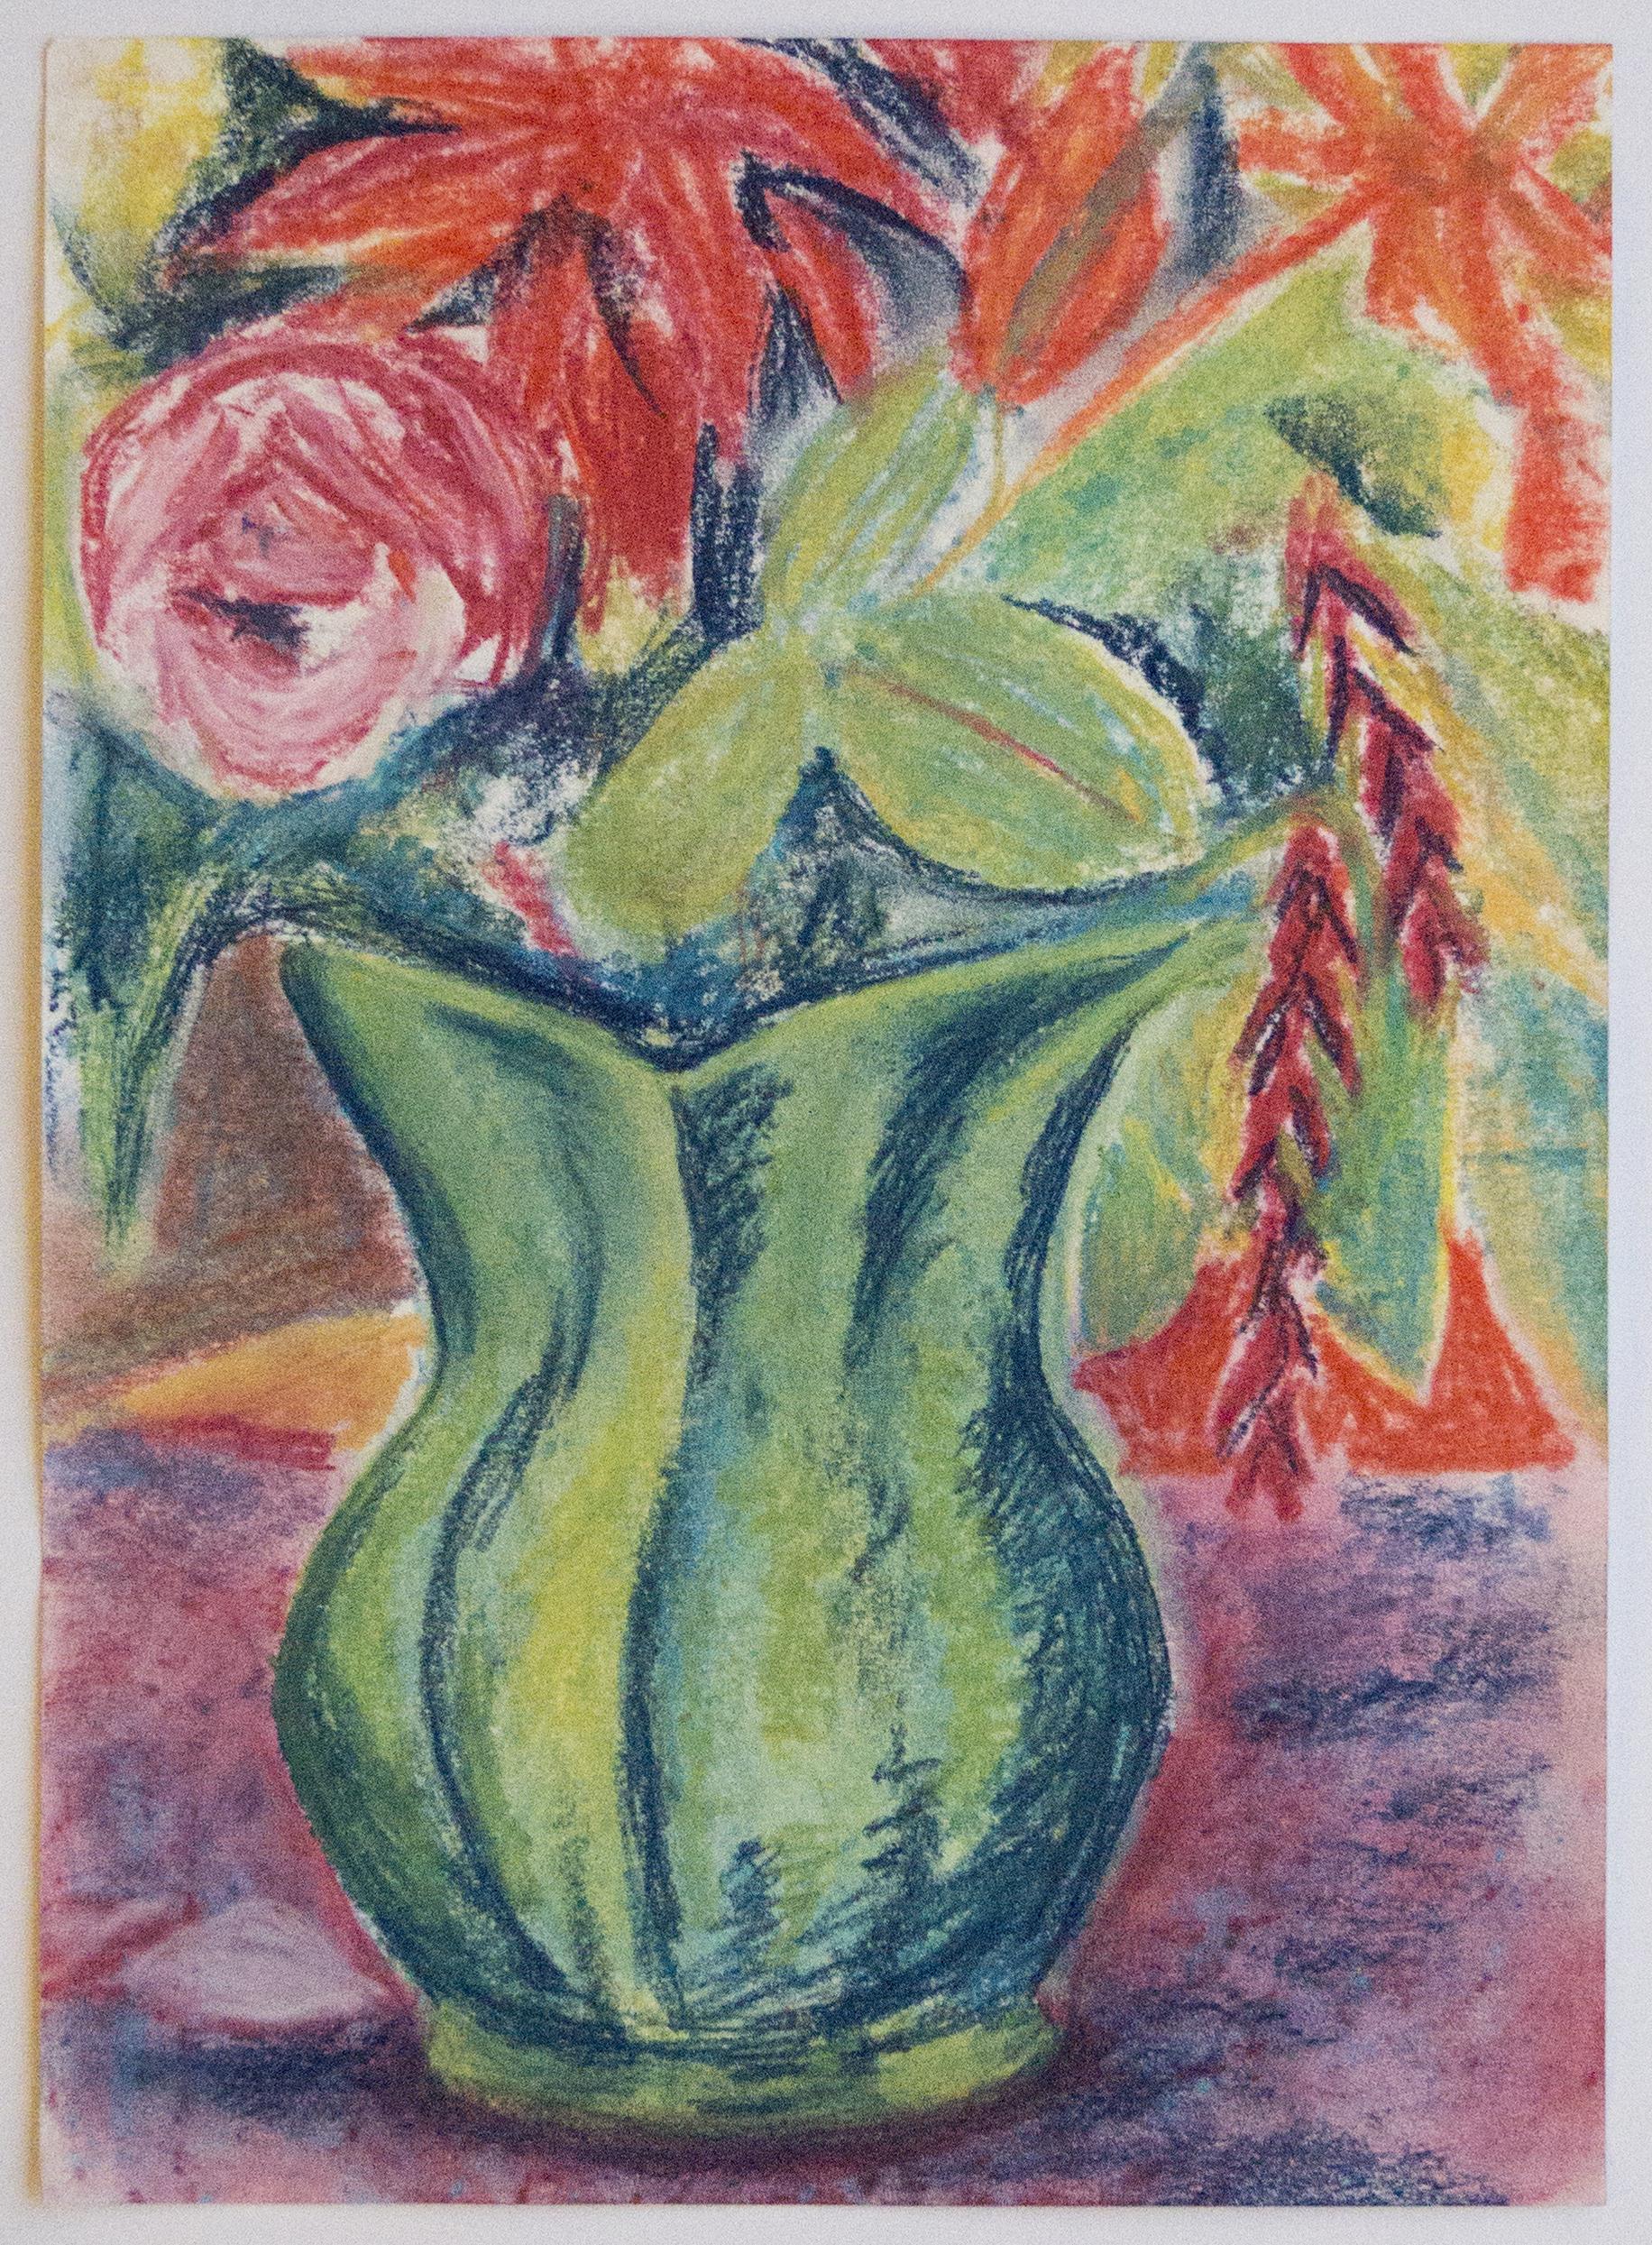 Flowers and Jug Still Life